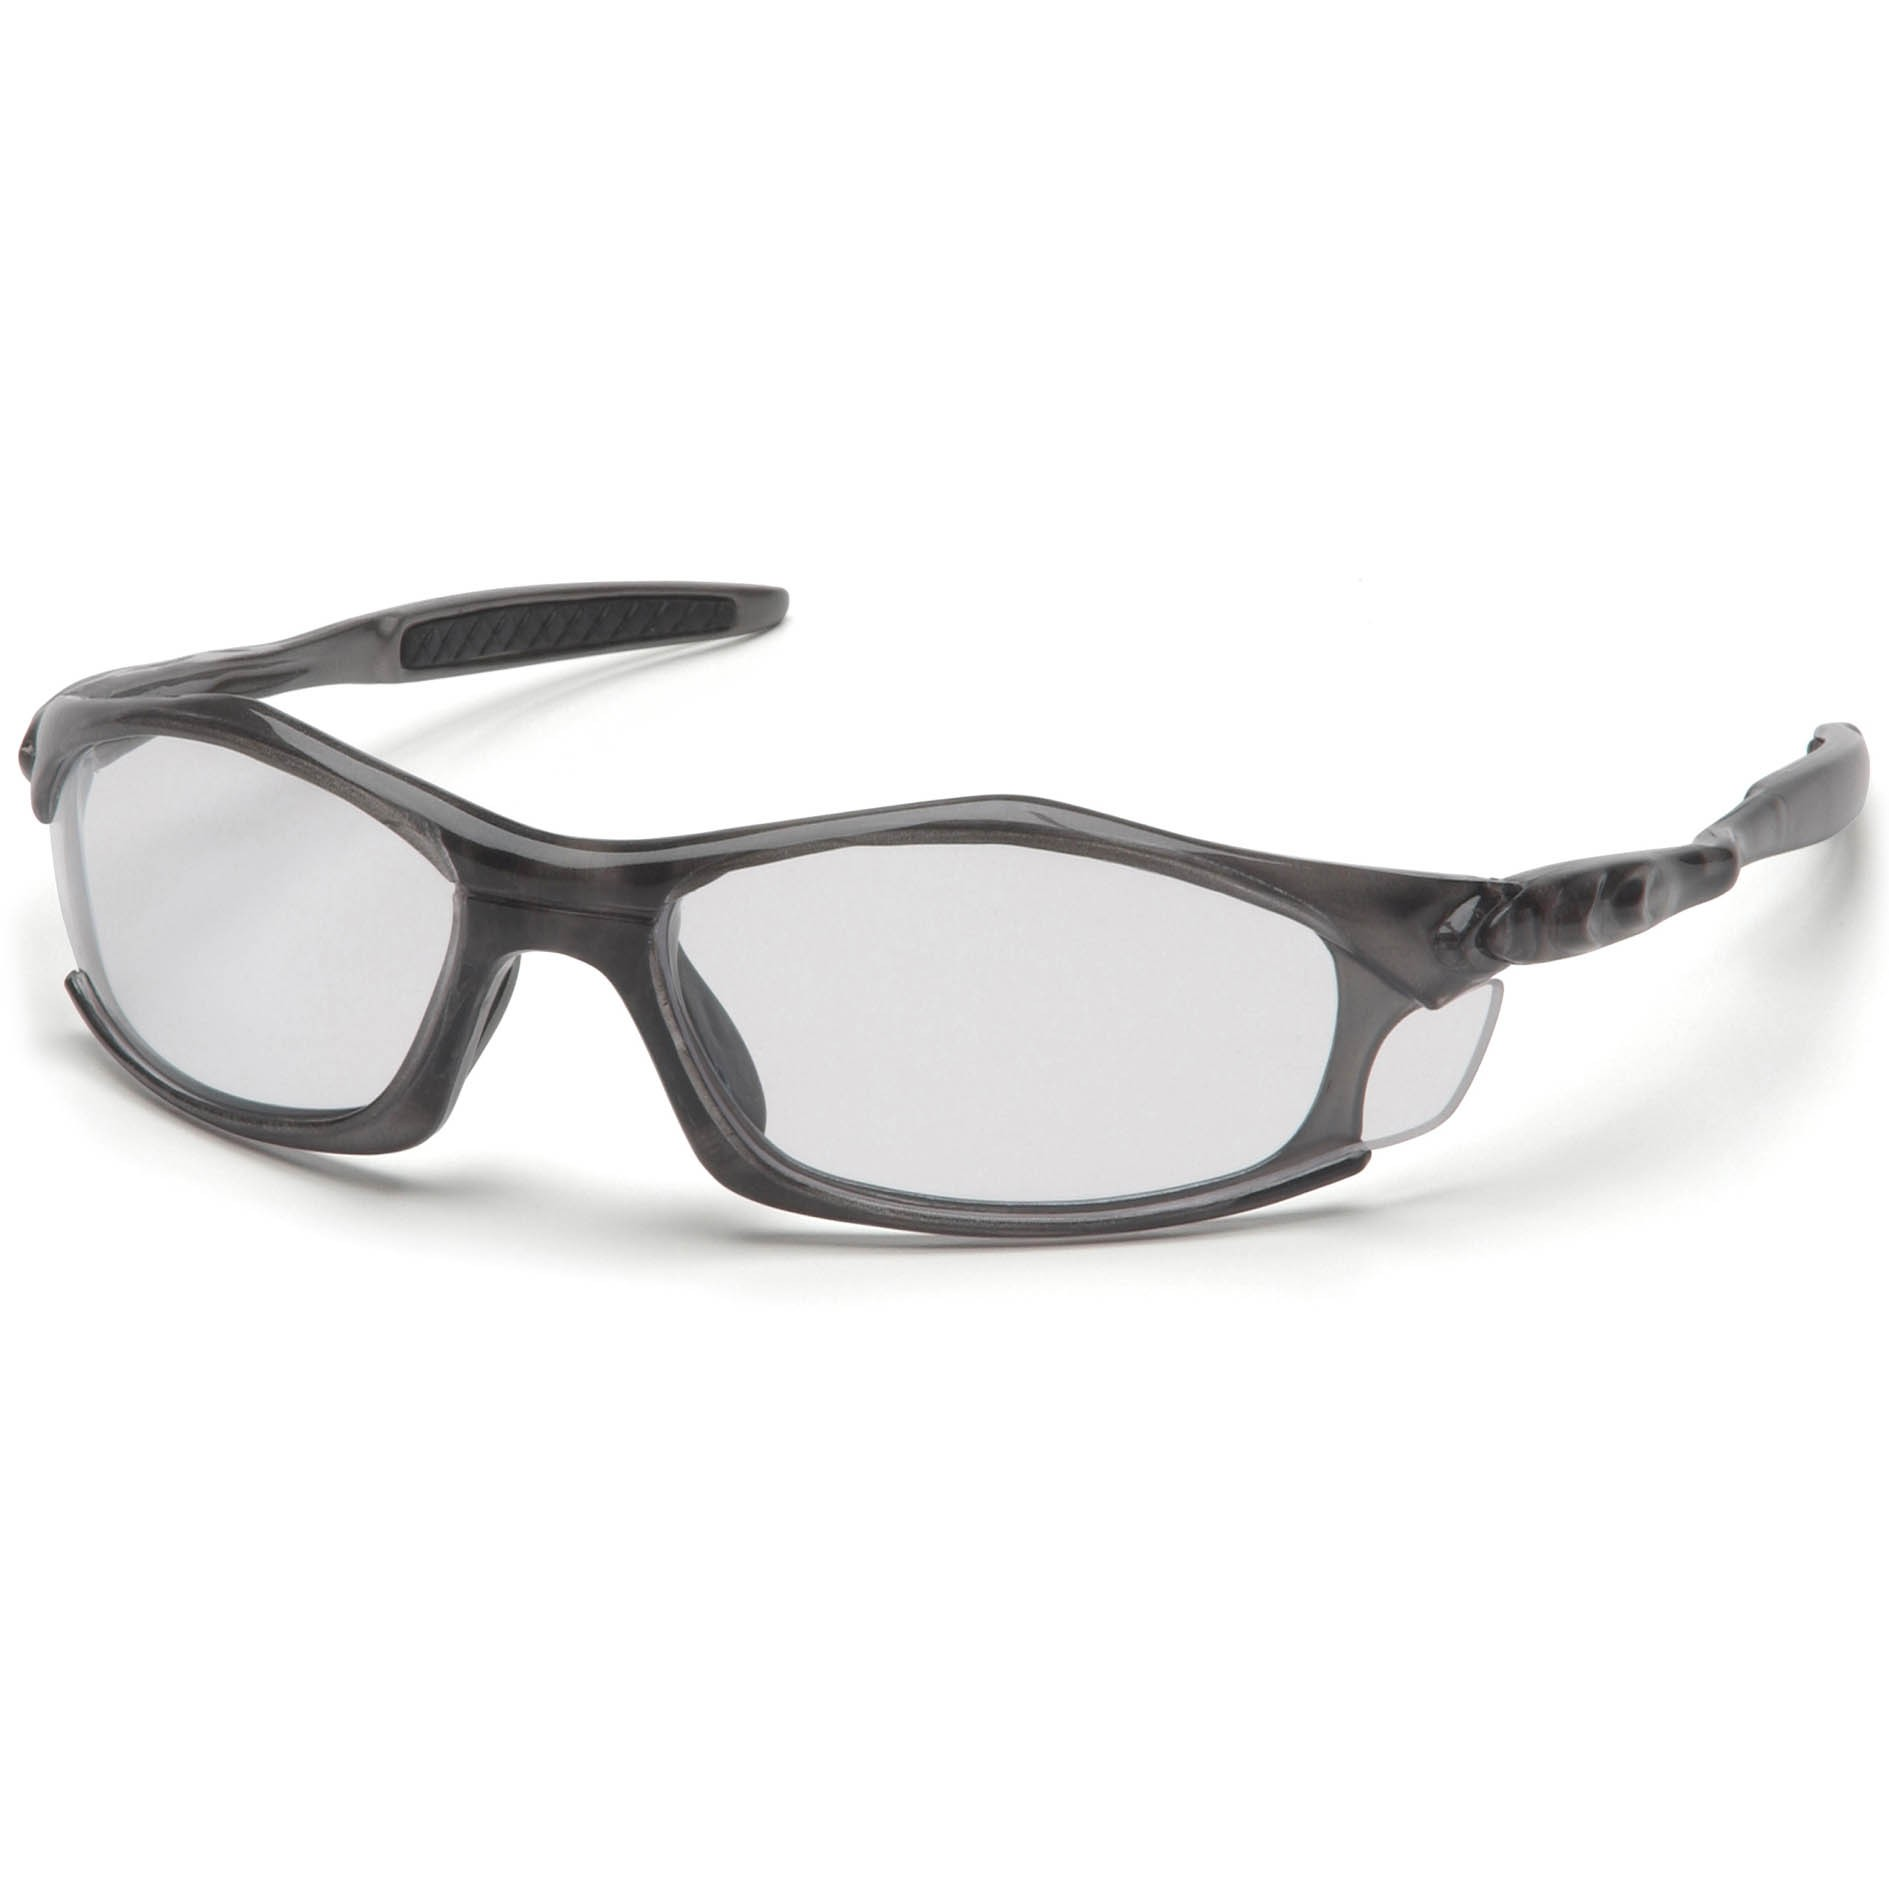 Glasses Gray Frame : Pyramex Solara Safety Glasses - Gray Frame - Clear Lens ...